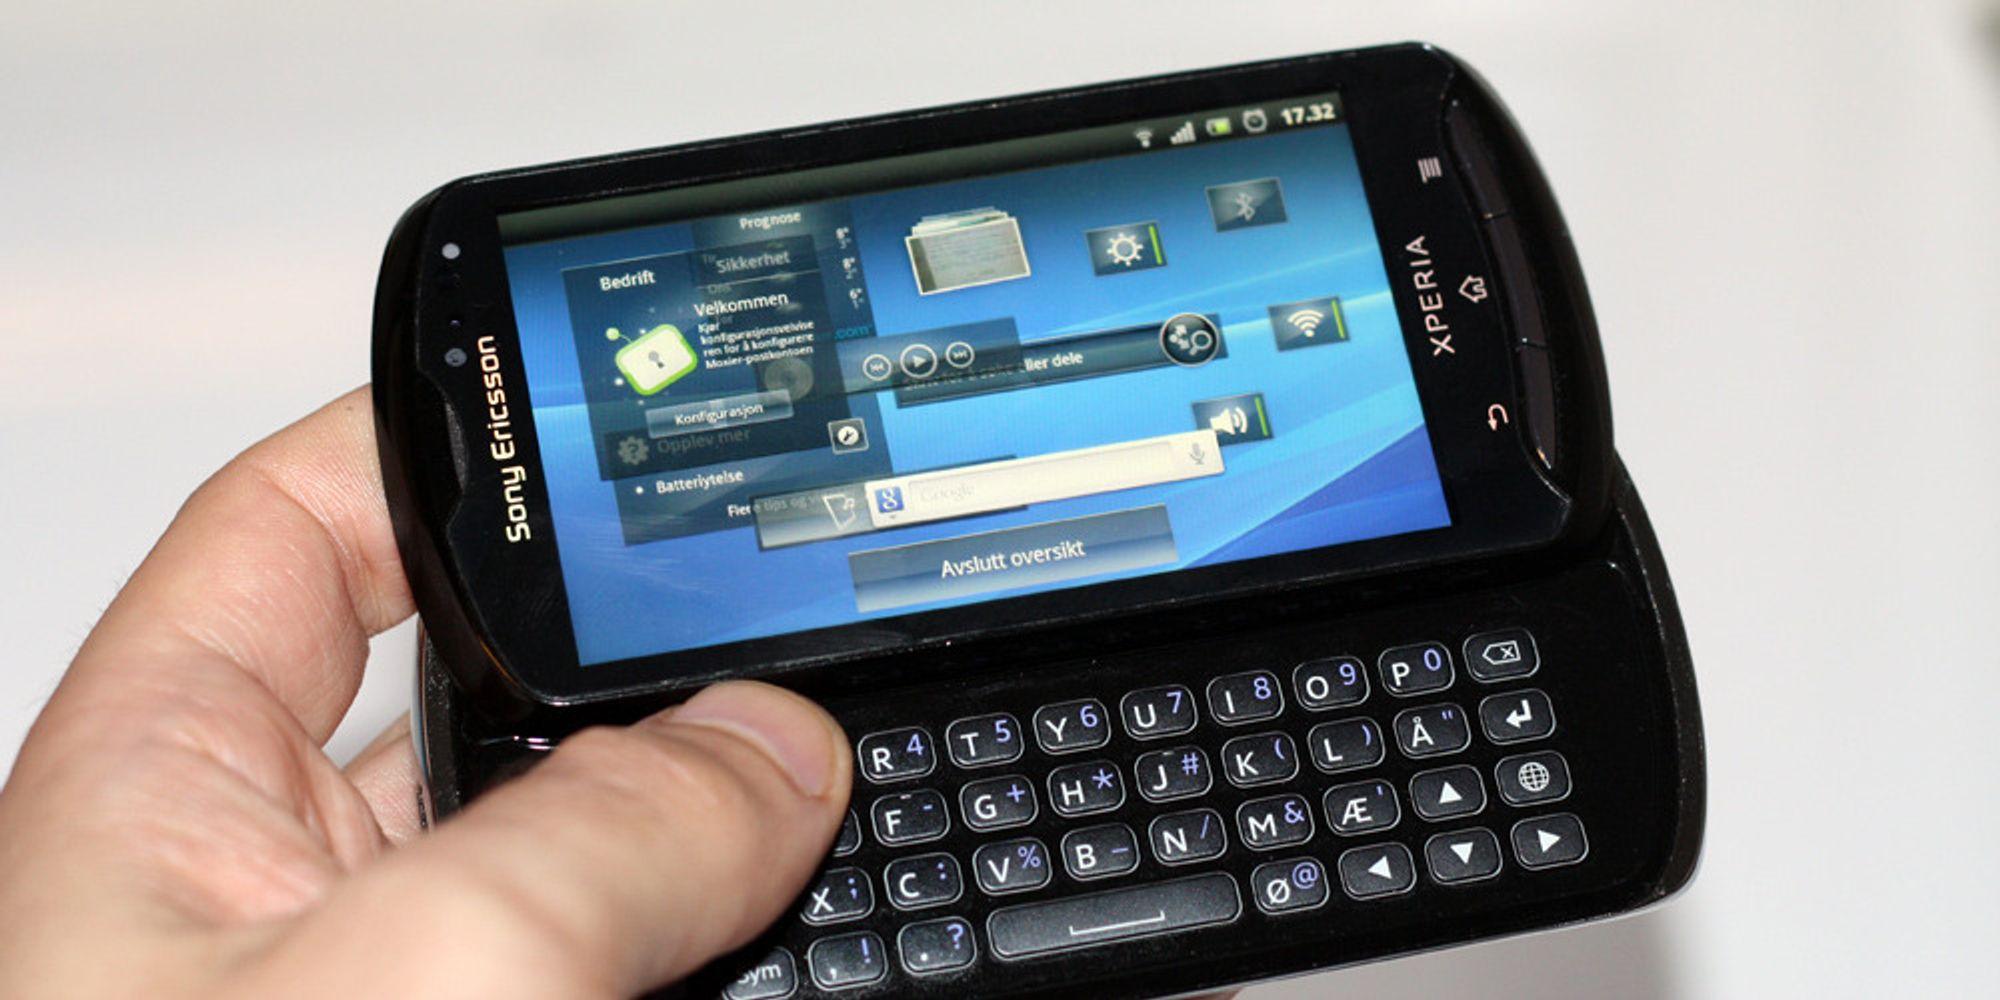 Android 4.0-bølge fra Sony